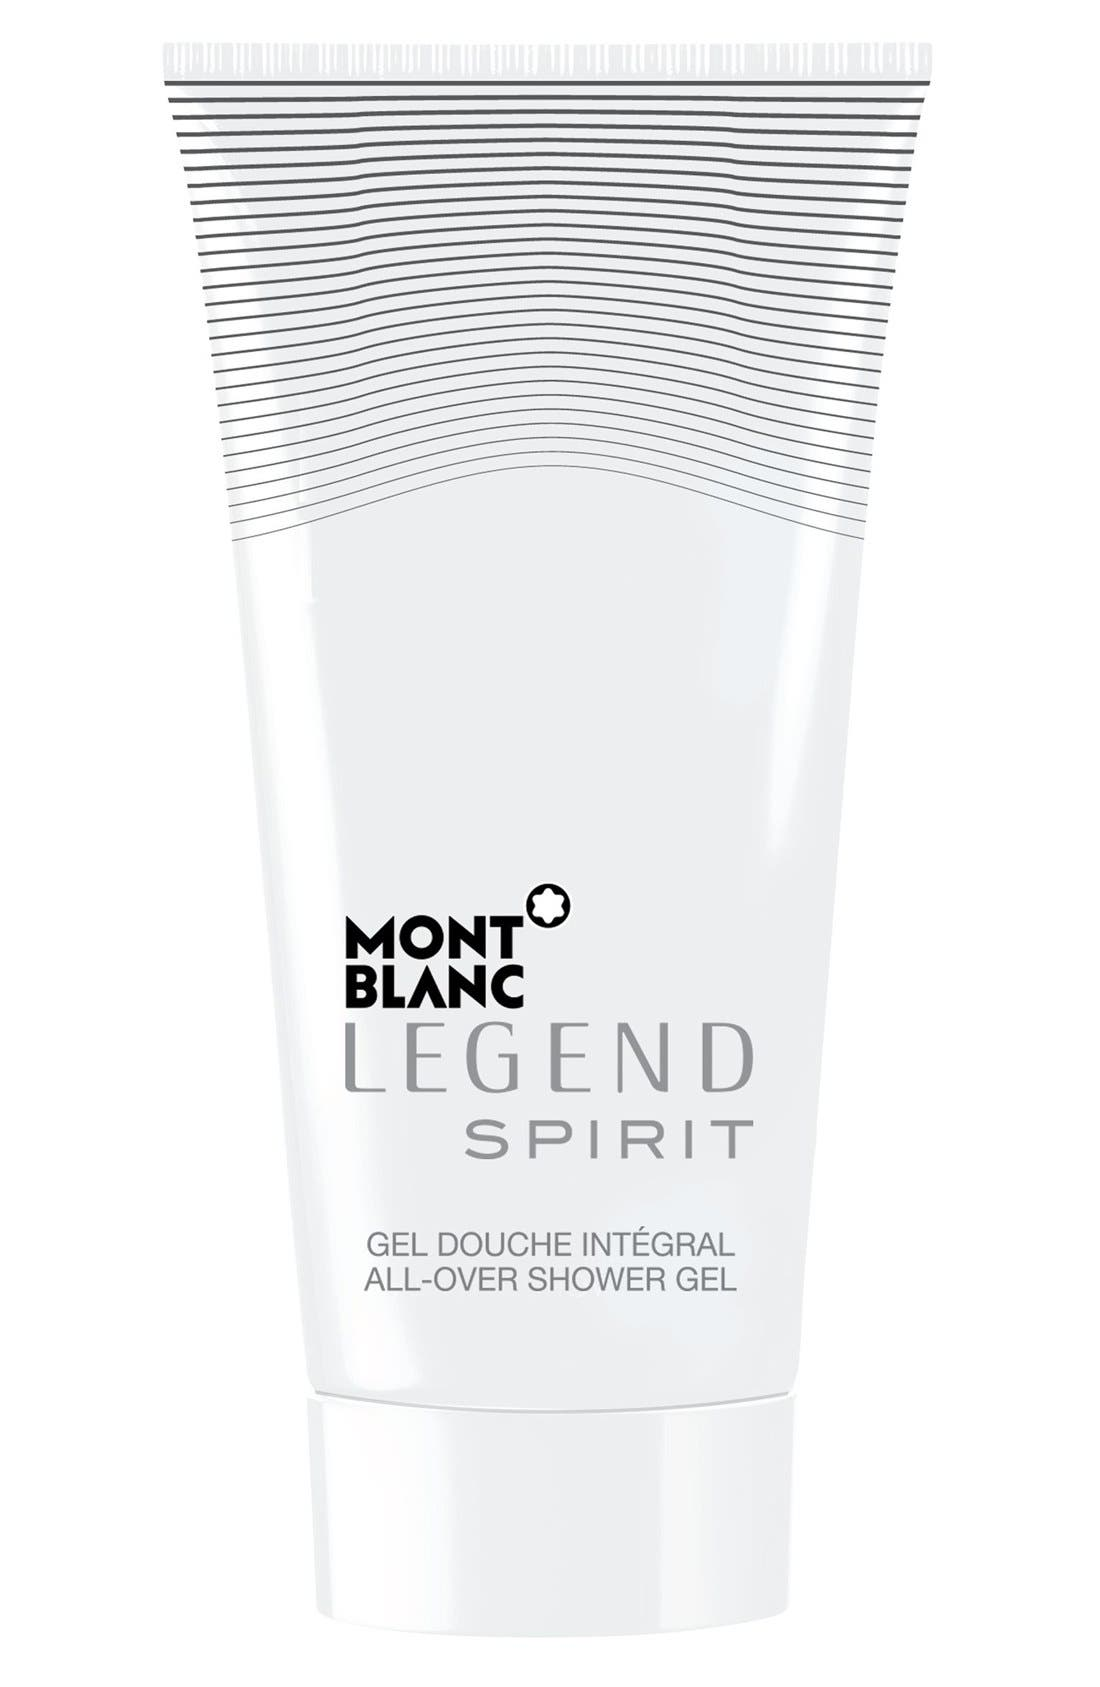 MONTBLANC, 'Legend Spirit' All-Over Shower Gel, Main thumbnail 1, color, NO COLOR